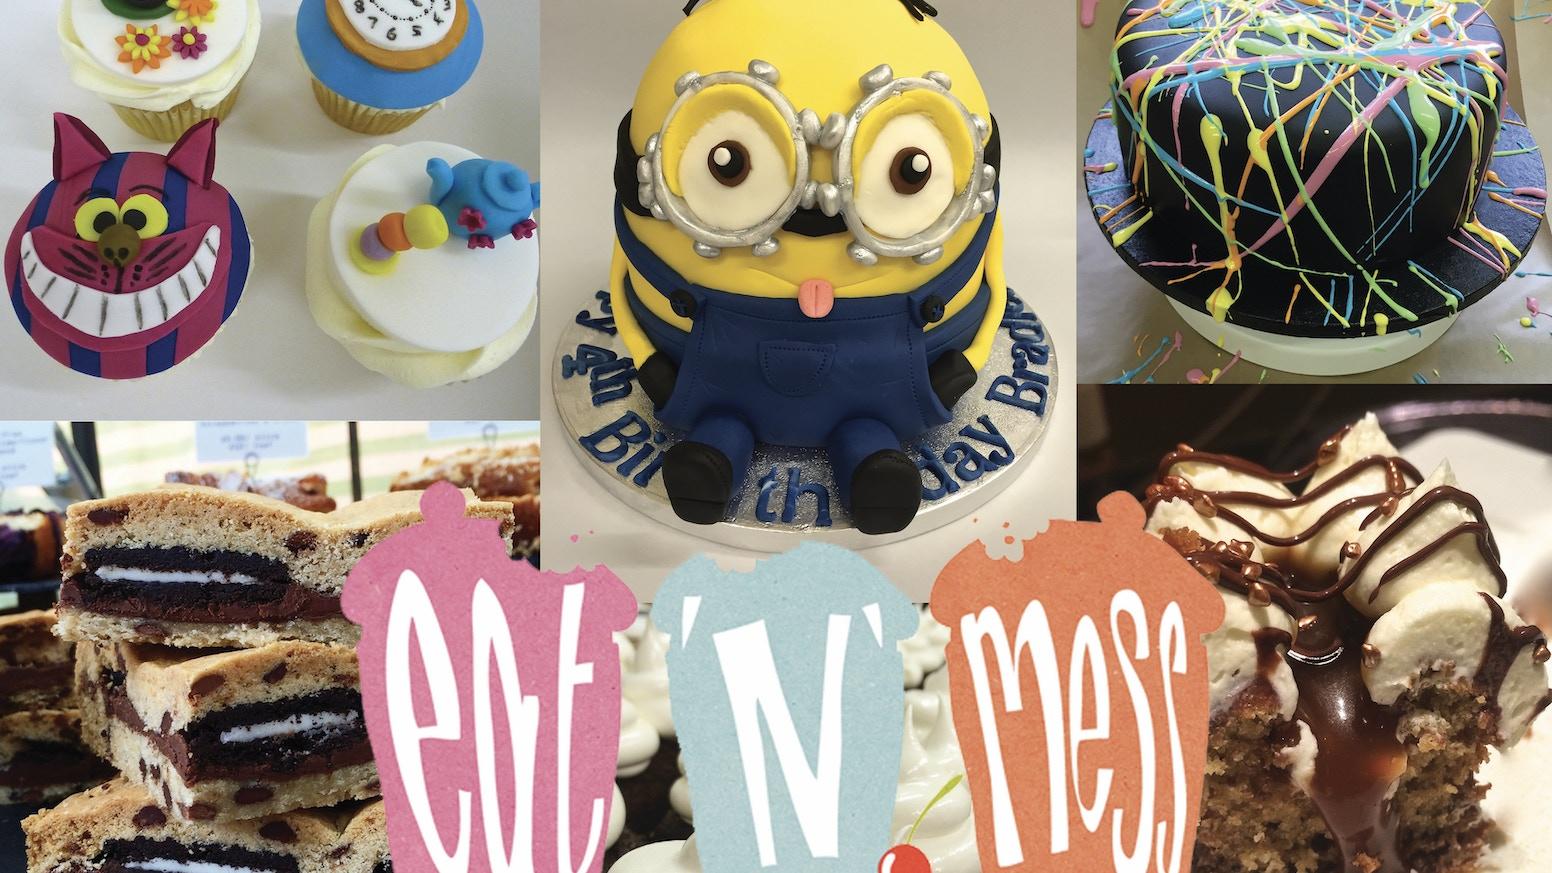 Eat n mess 1st Cake Shop - Making Gluten Free Taste Good by